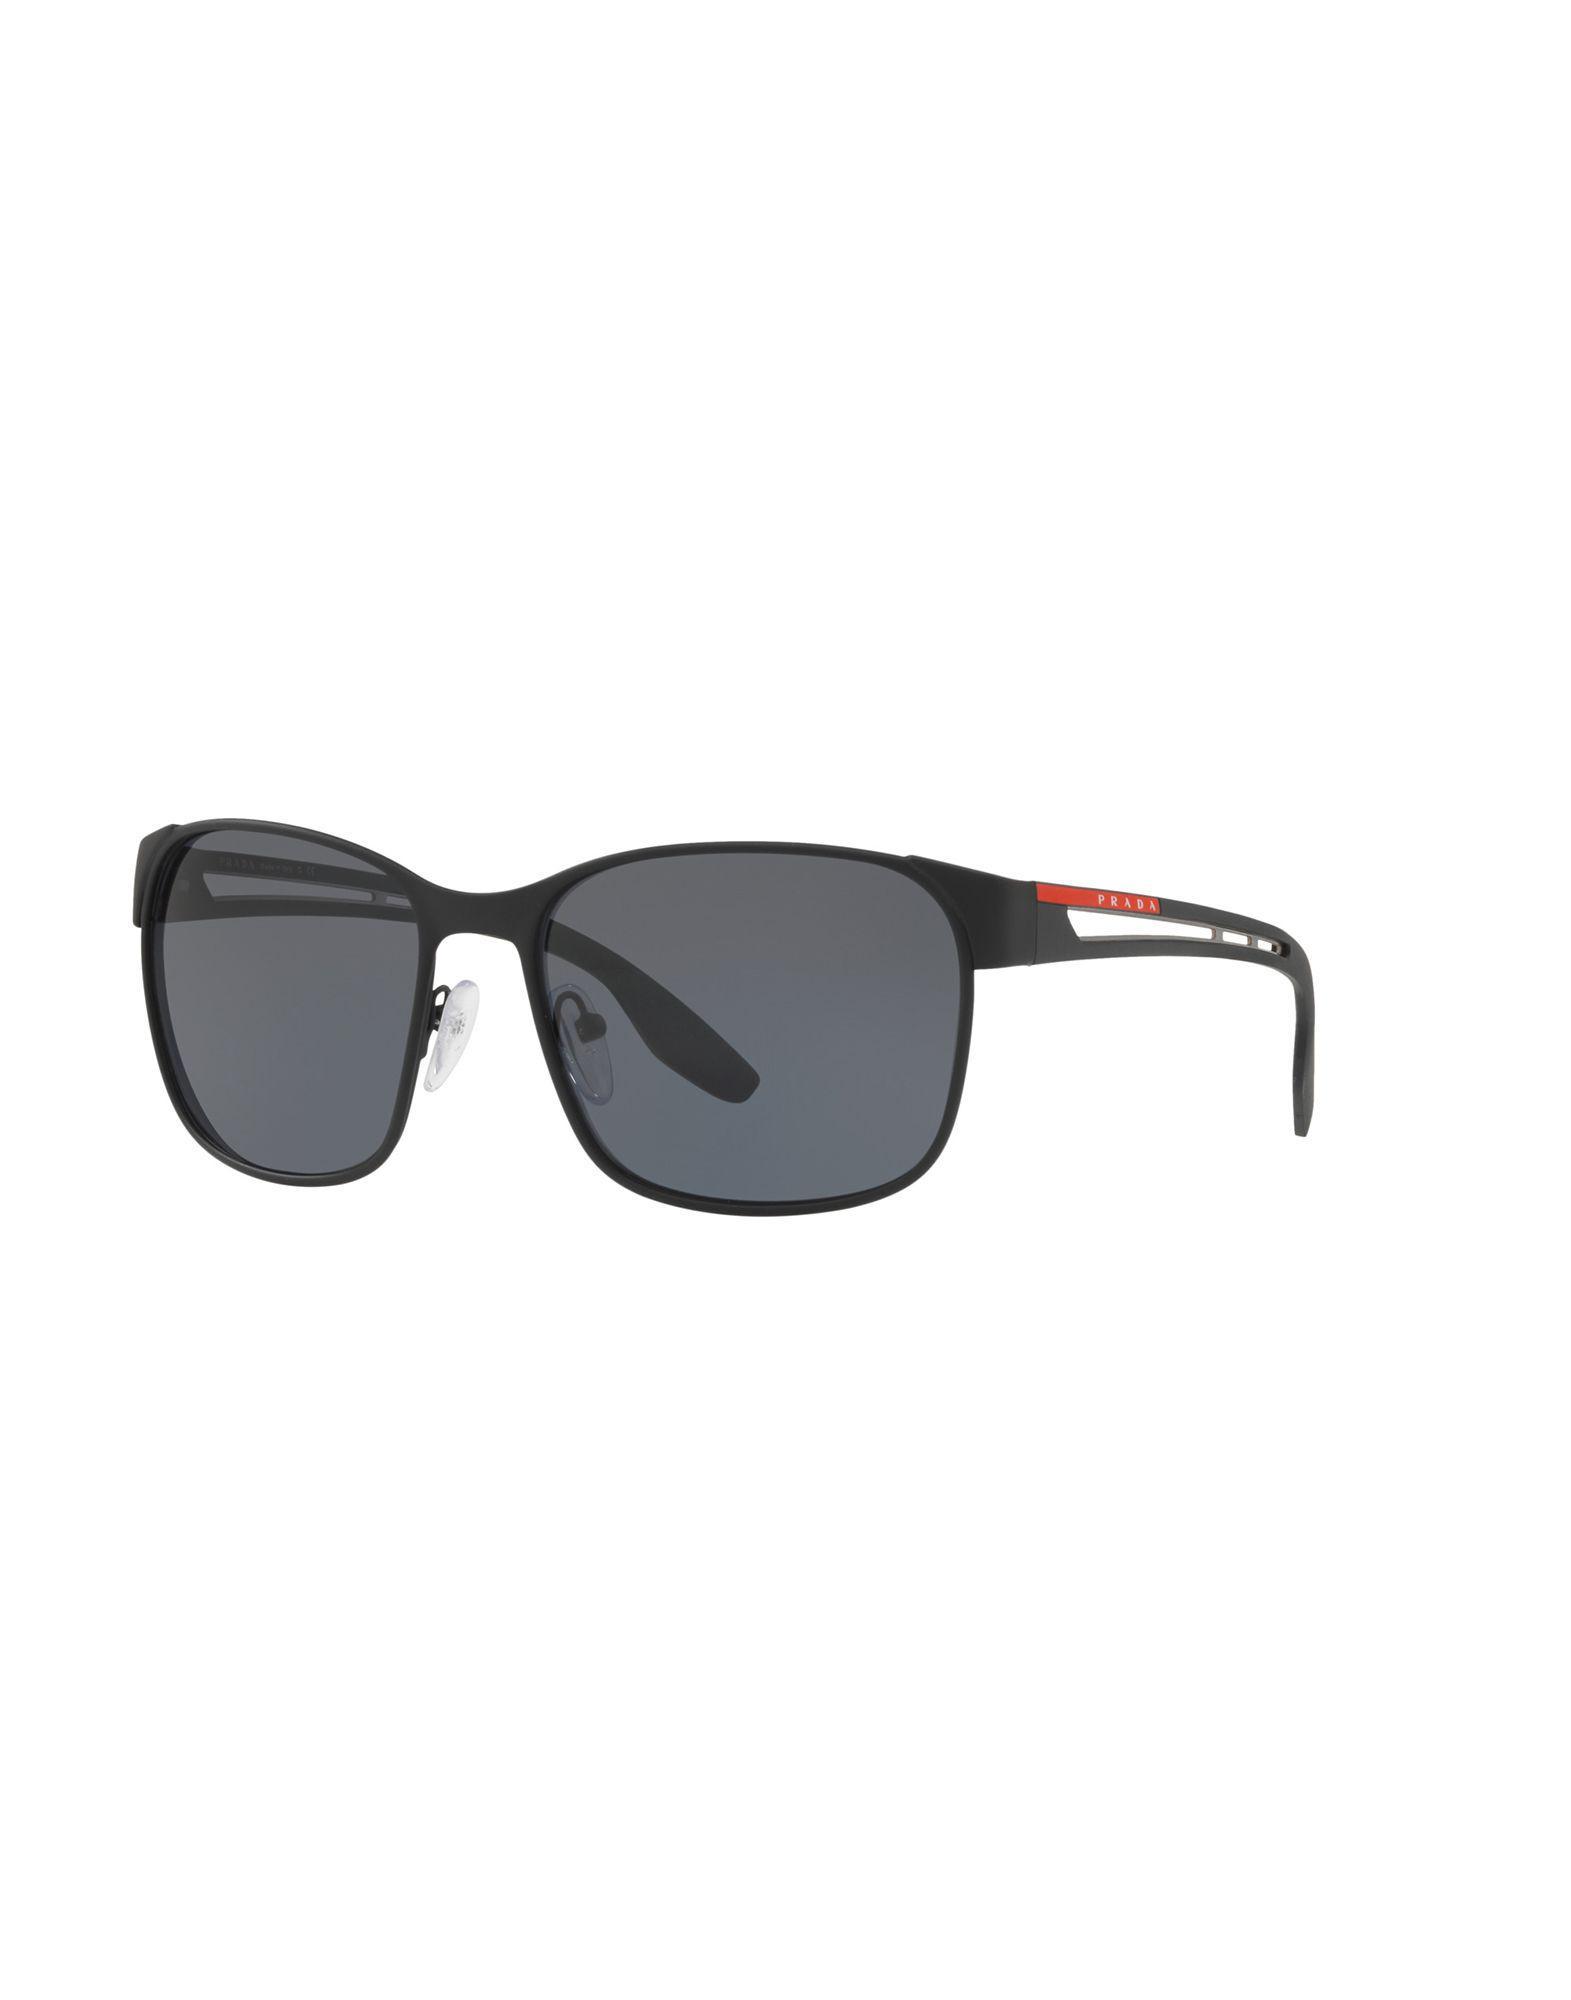 c69dcdb29c1 Prada - Black Sunglasses for Men - Lyst. View fullscreen